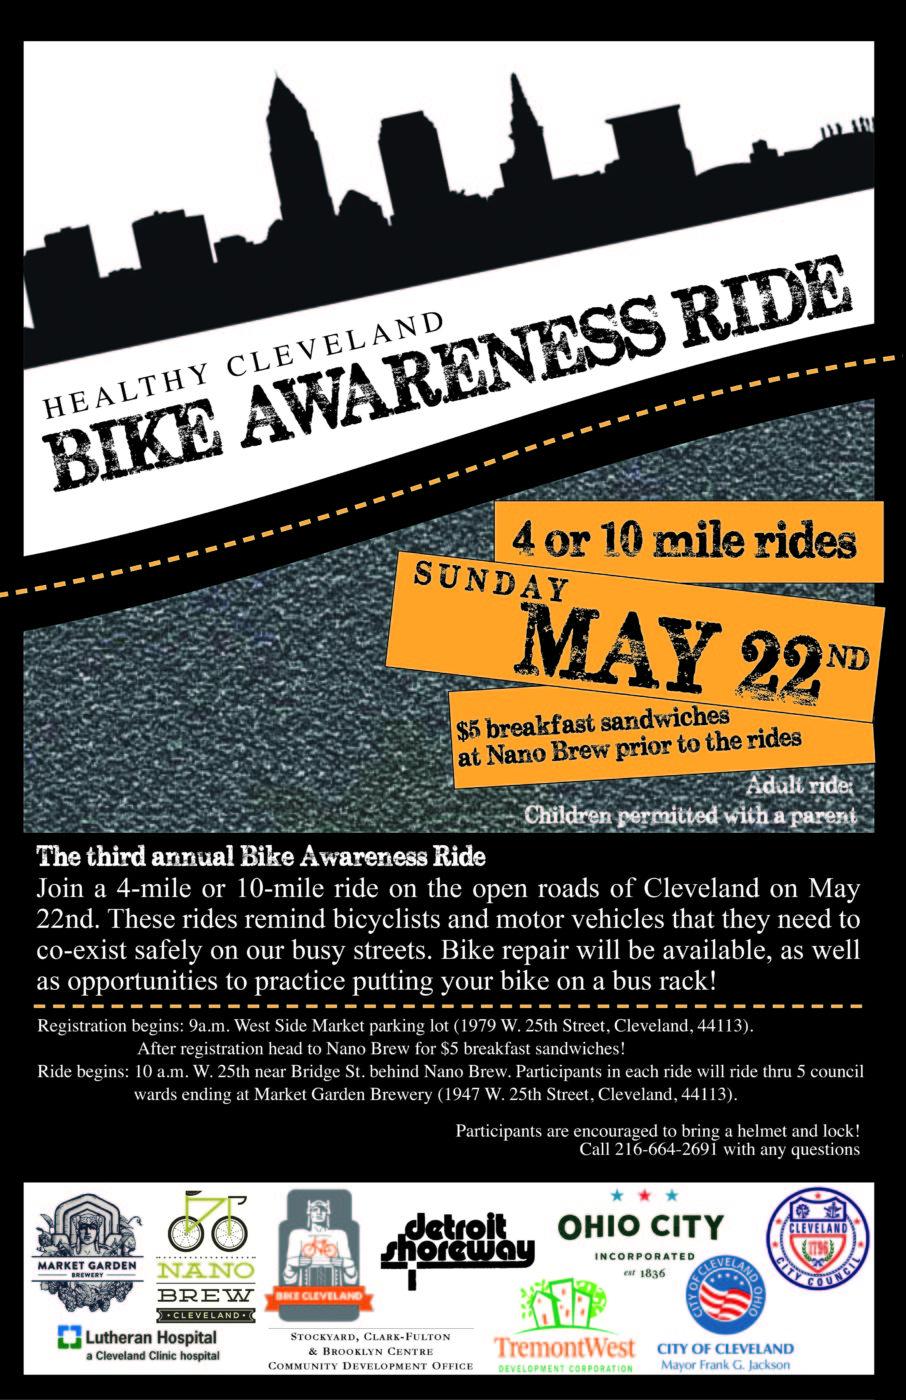 Bike Awareness Ride 15 2